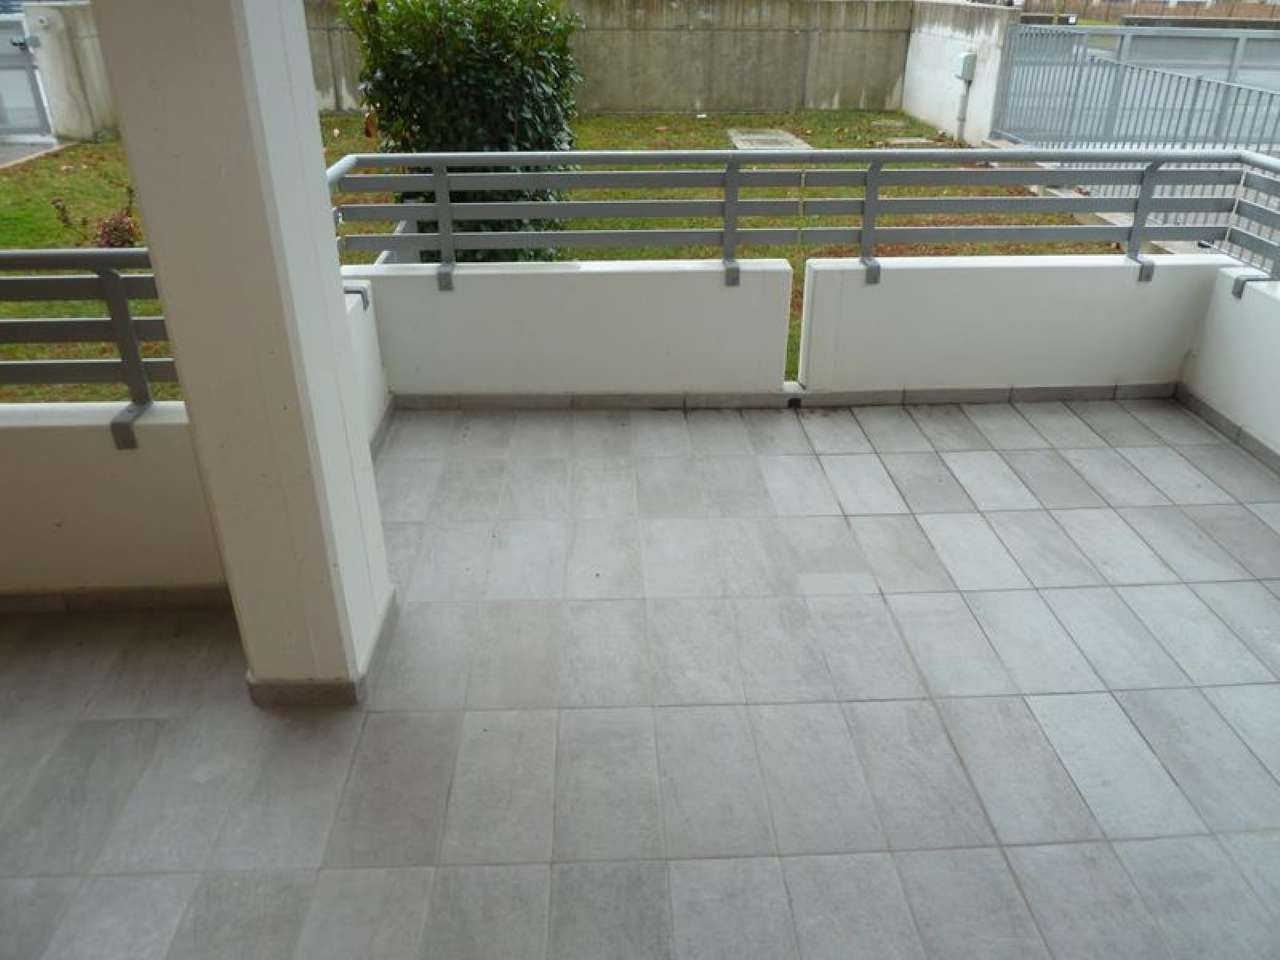 Appartamento bicamere in vendita a Udine,Zona Vat